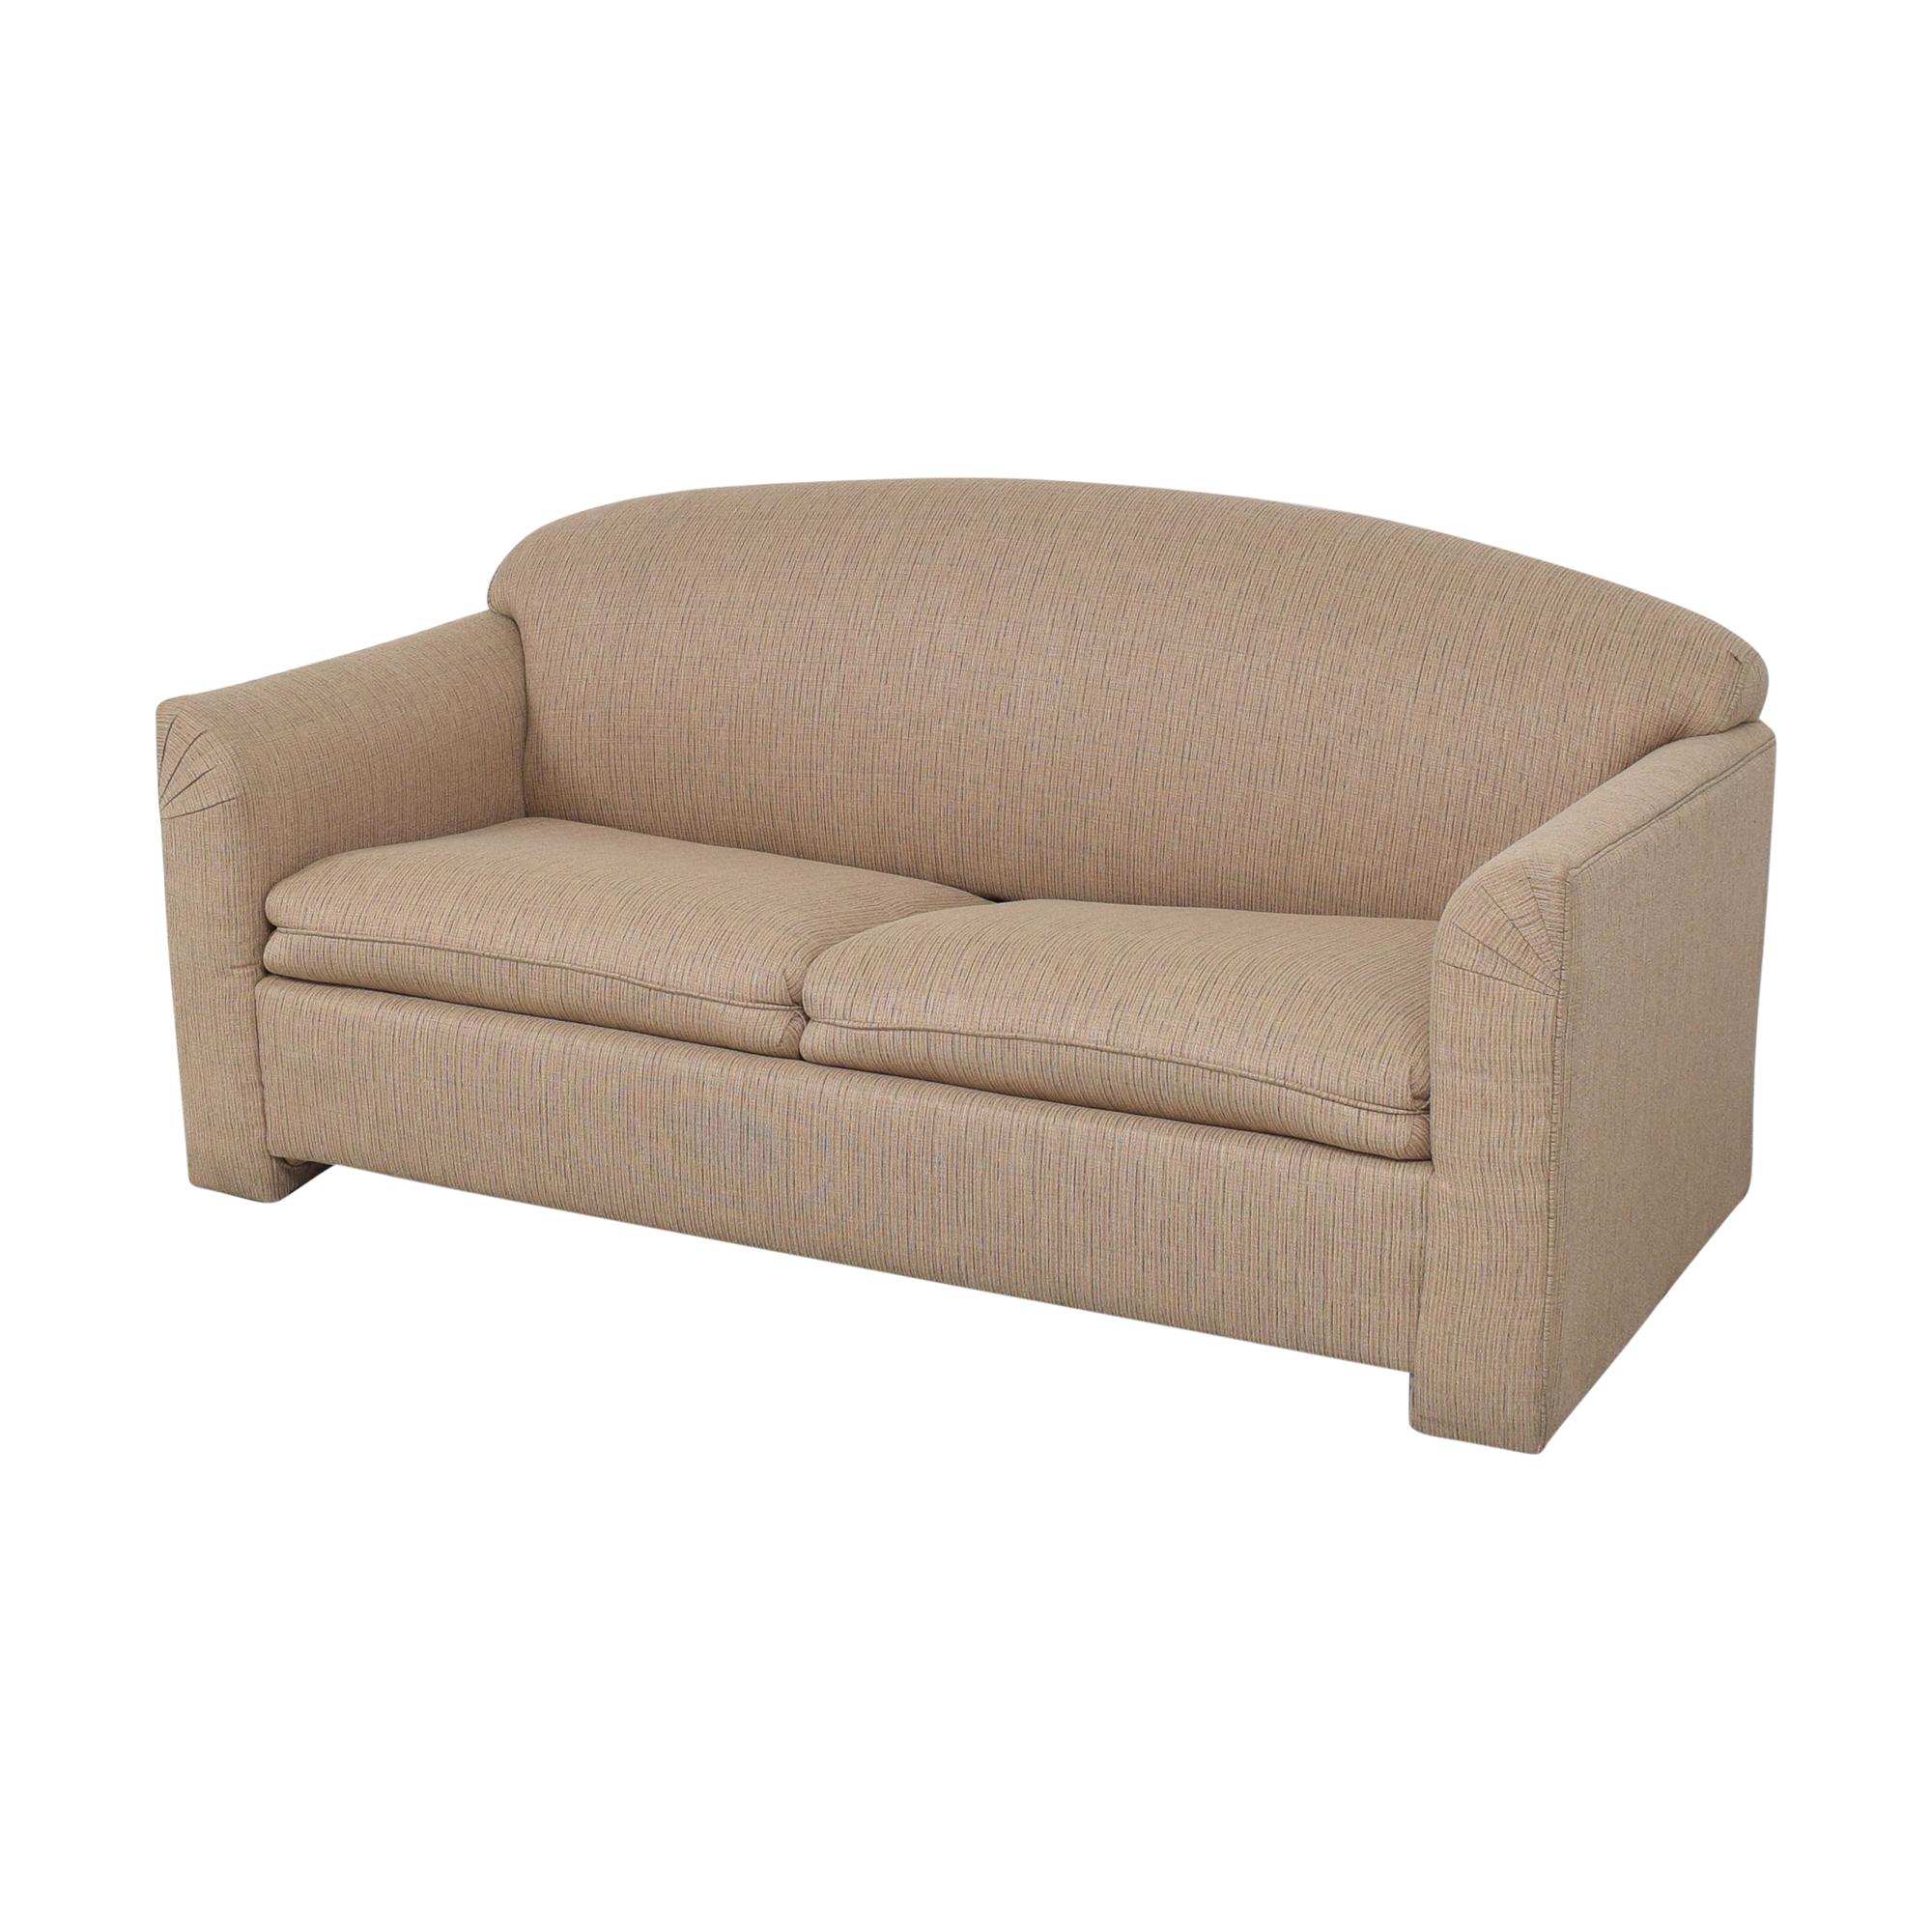 Simmons Two Cushion Sleeper Sofa Simmons